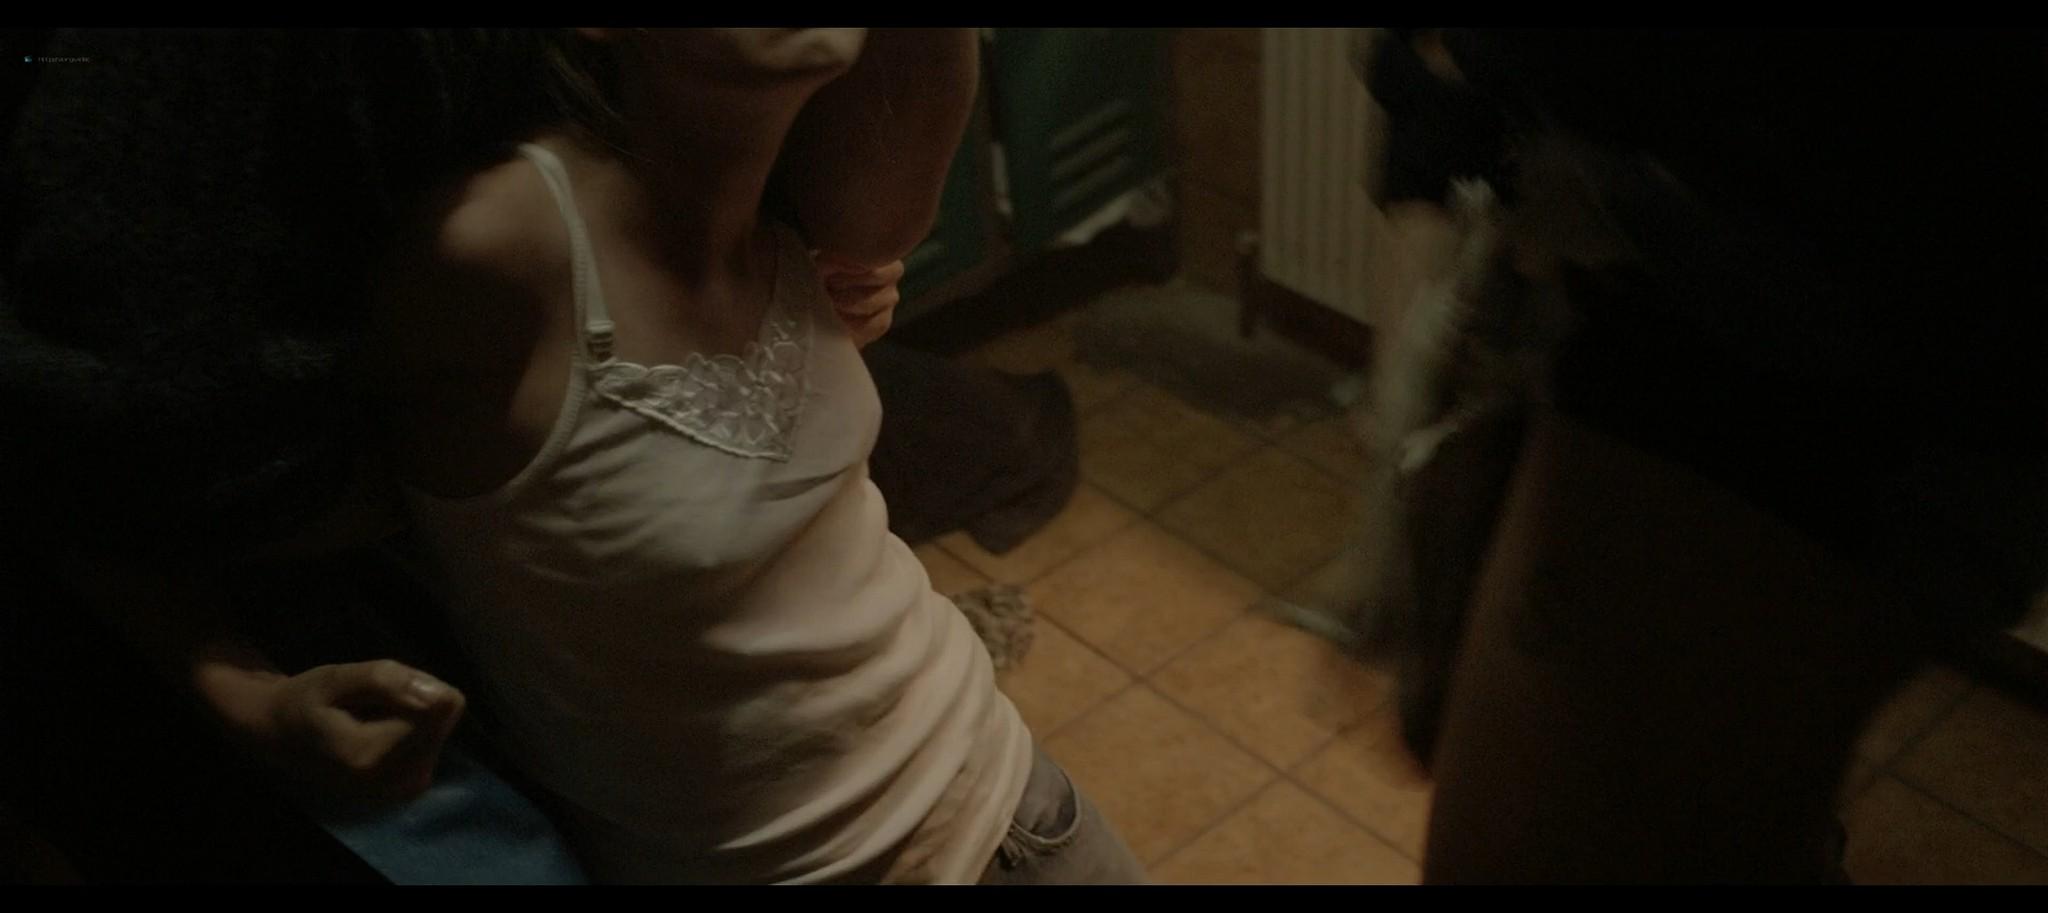 Sonia Suhl nude topless and some sex When Animals Dream DE DK 2014 HD 1080p BluRay 6